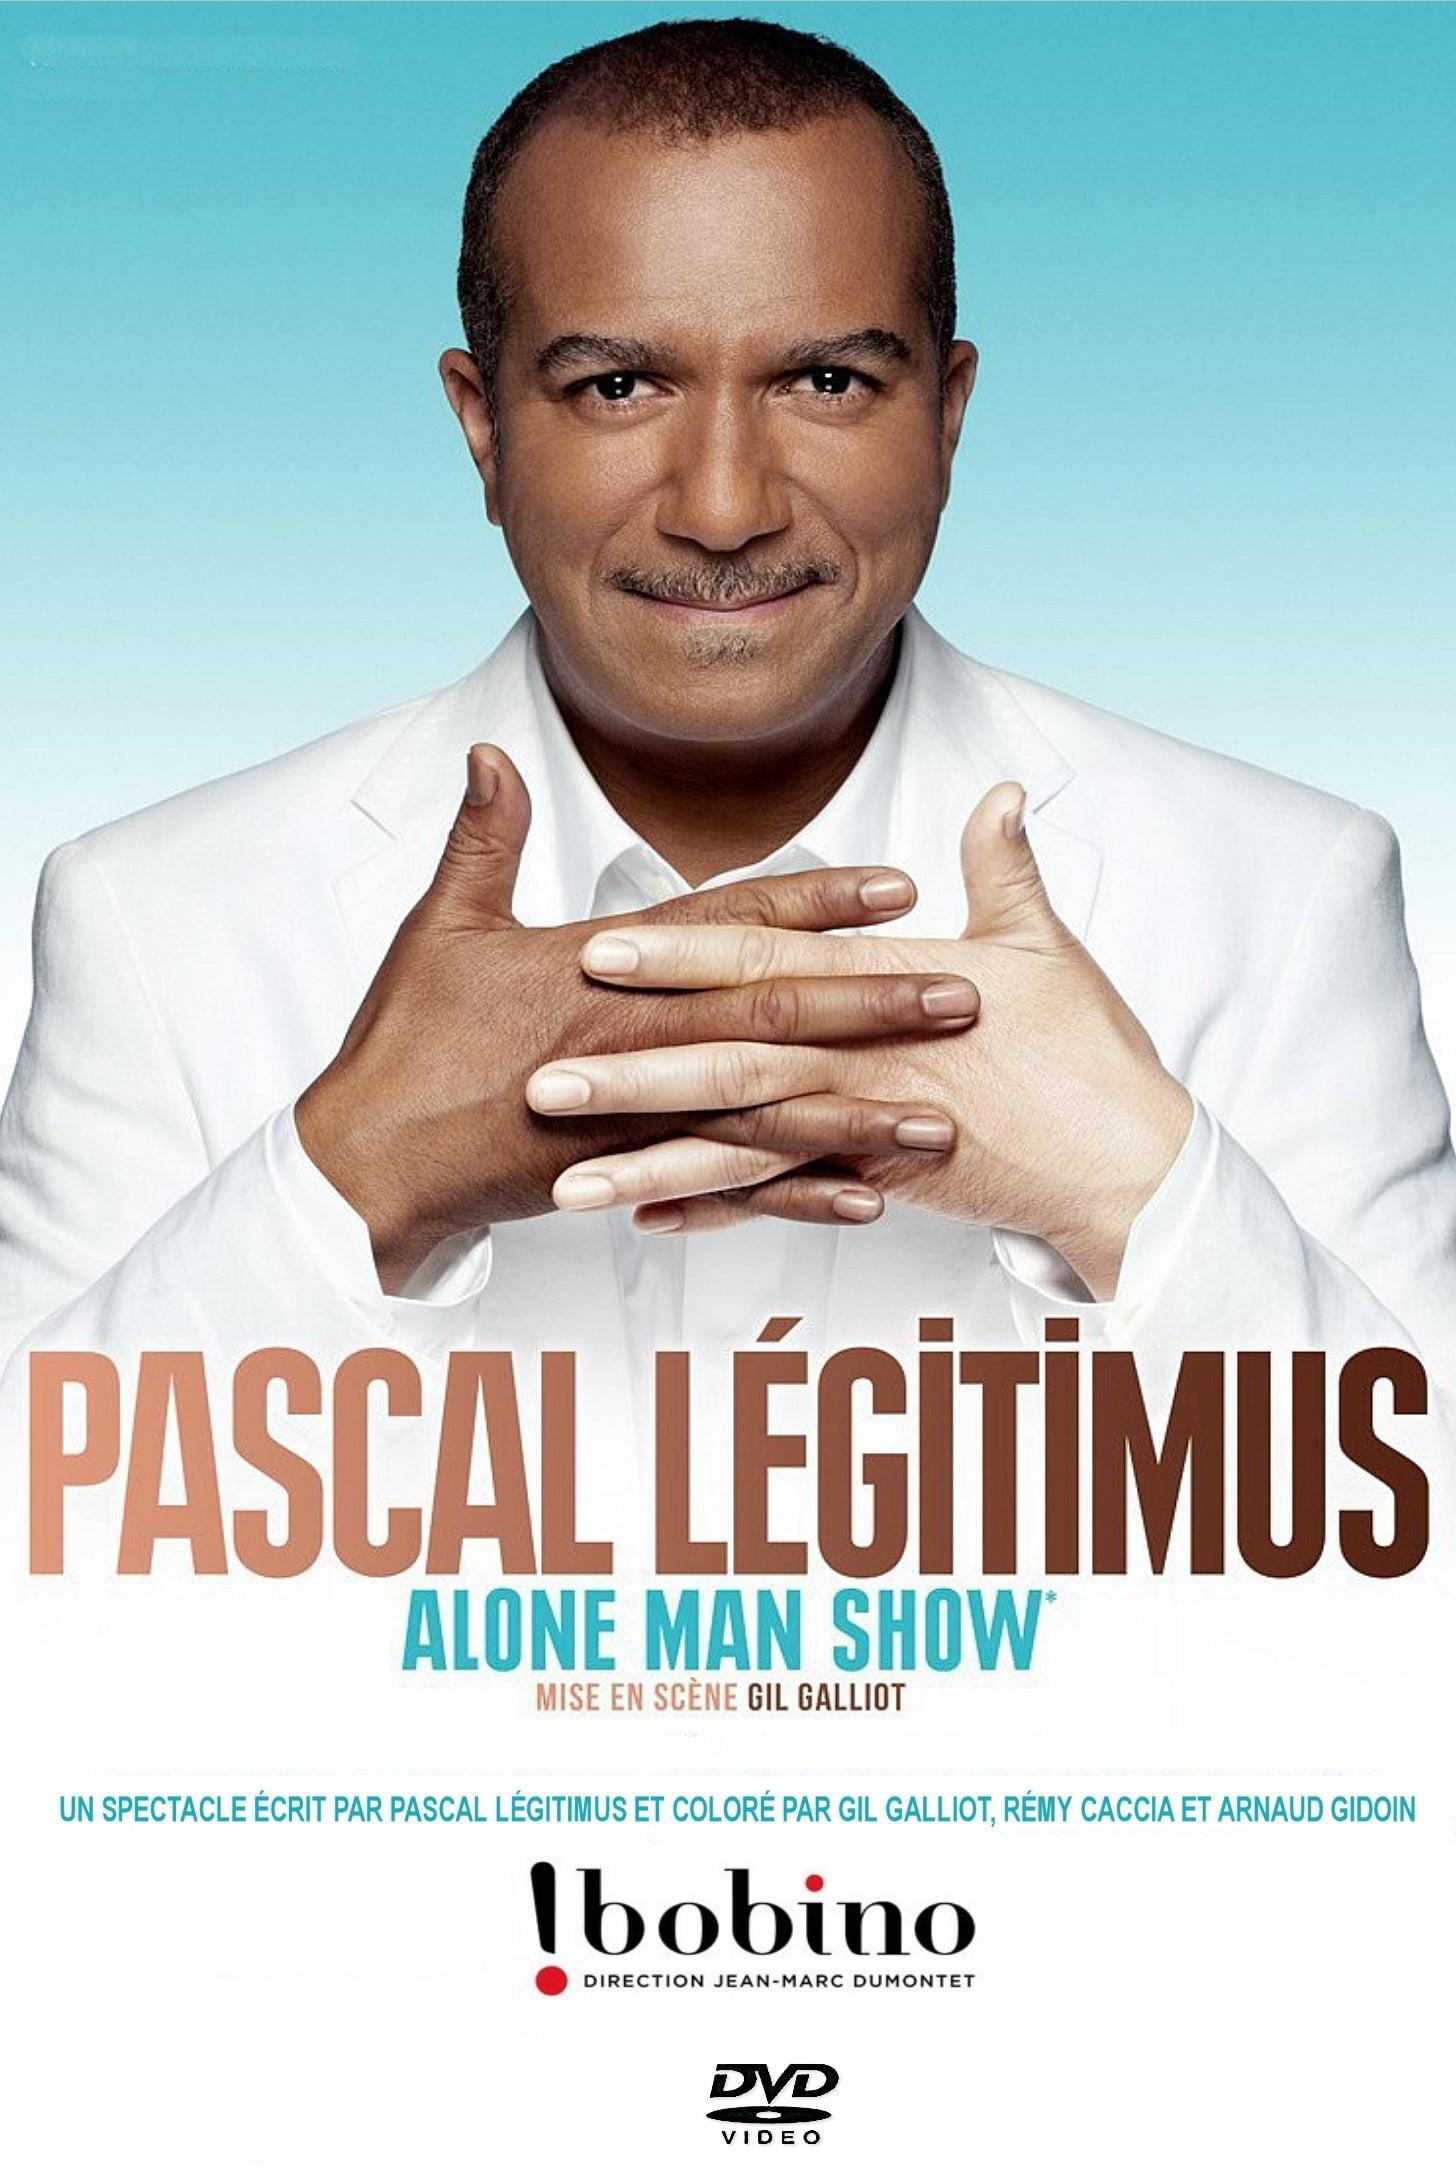 Alone Man Show